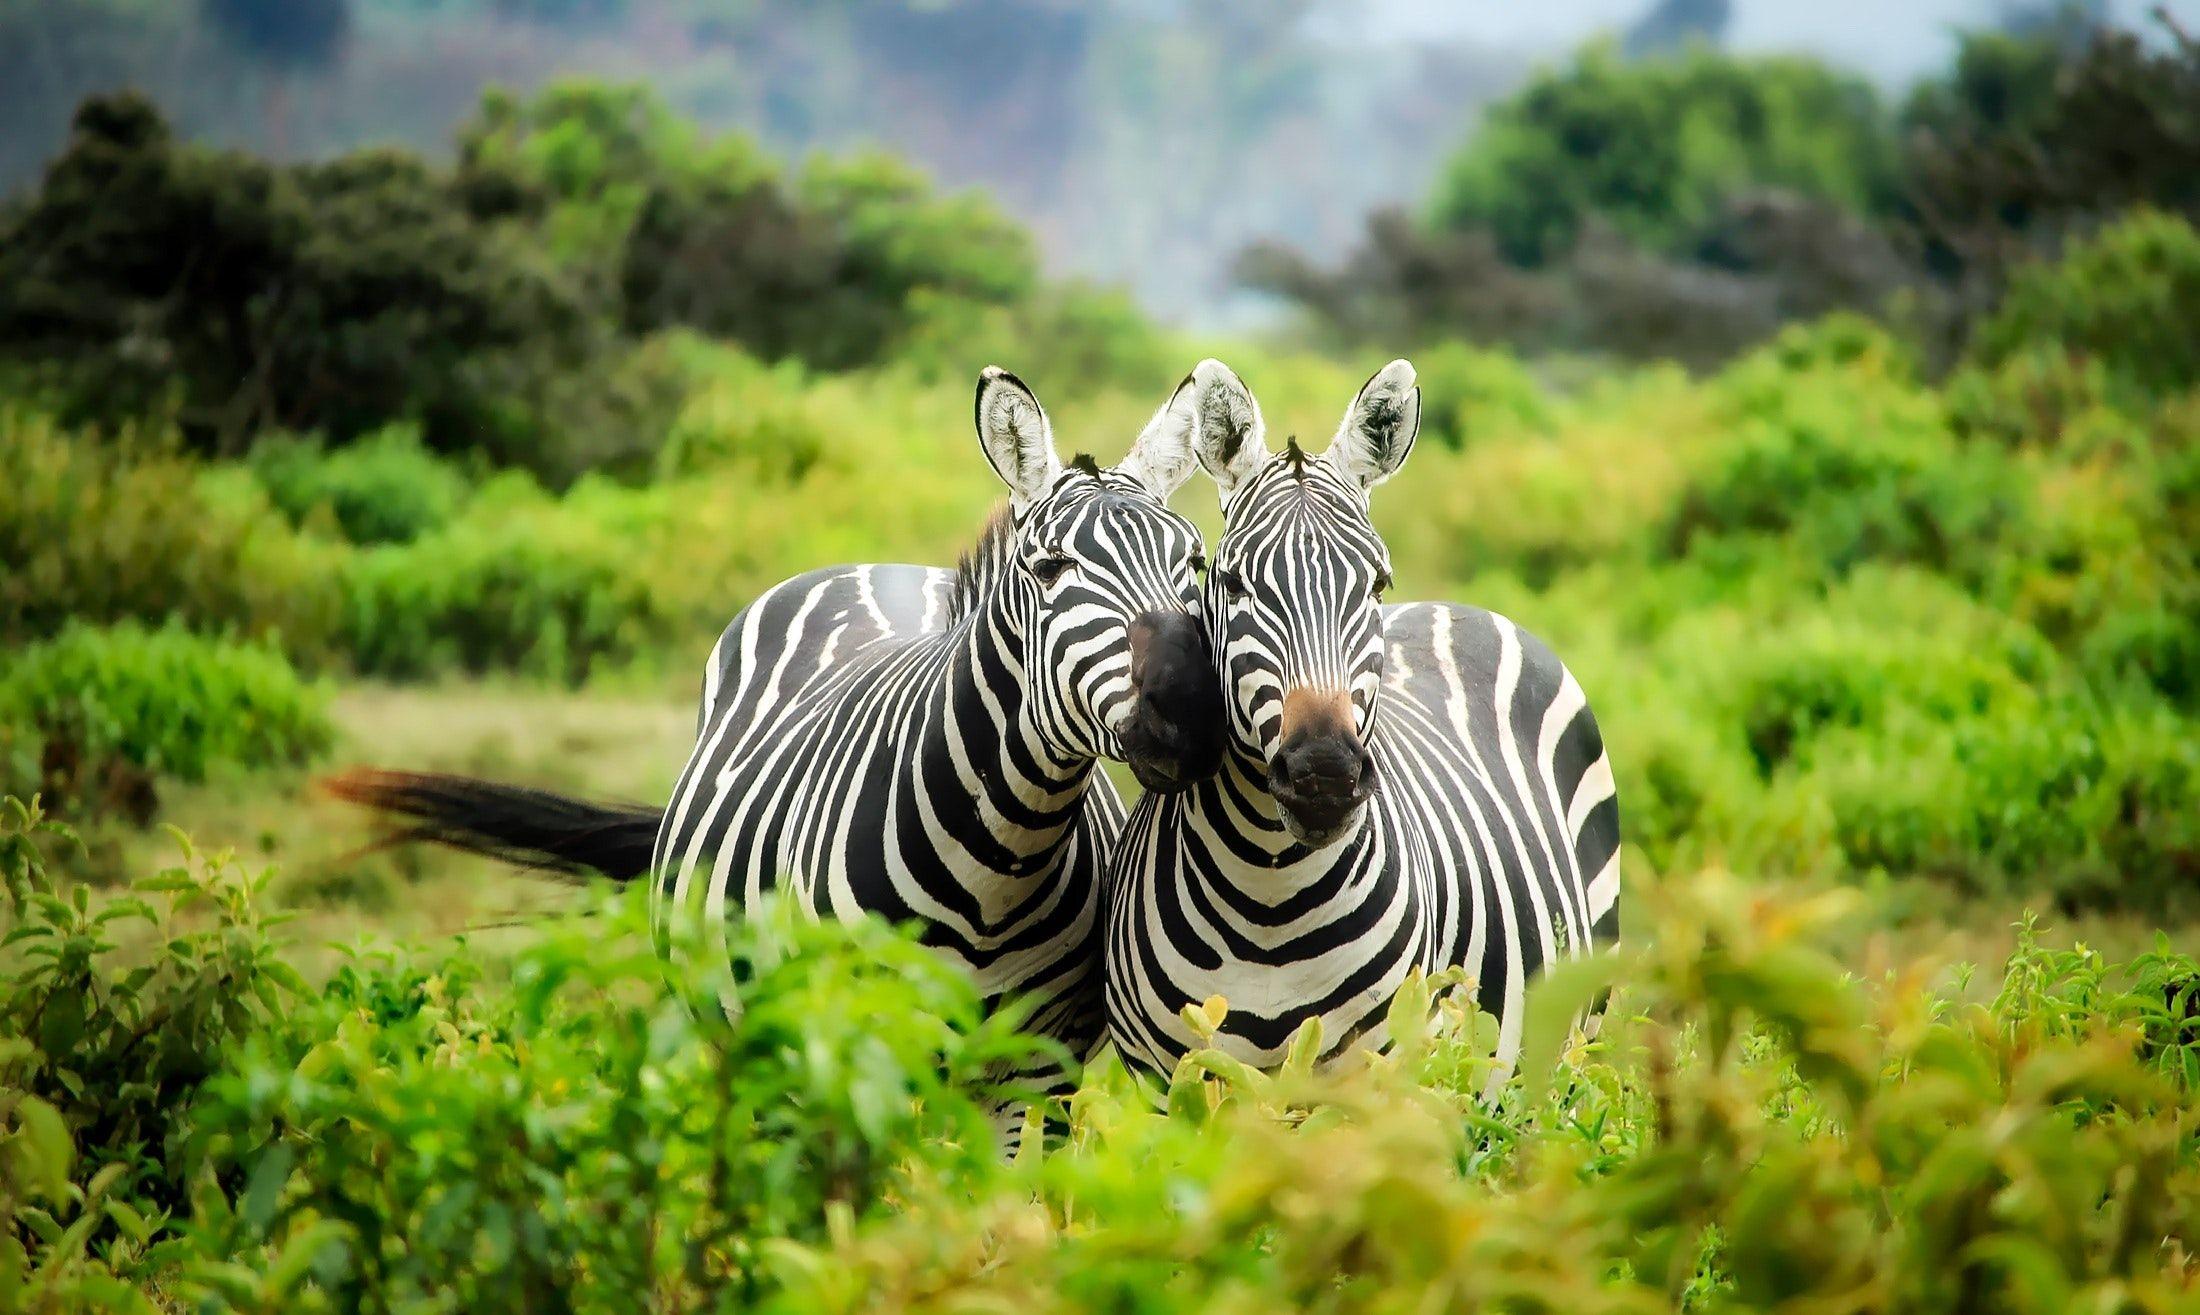 zebras-on-zebra-247376.jpg